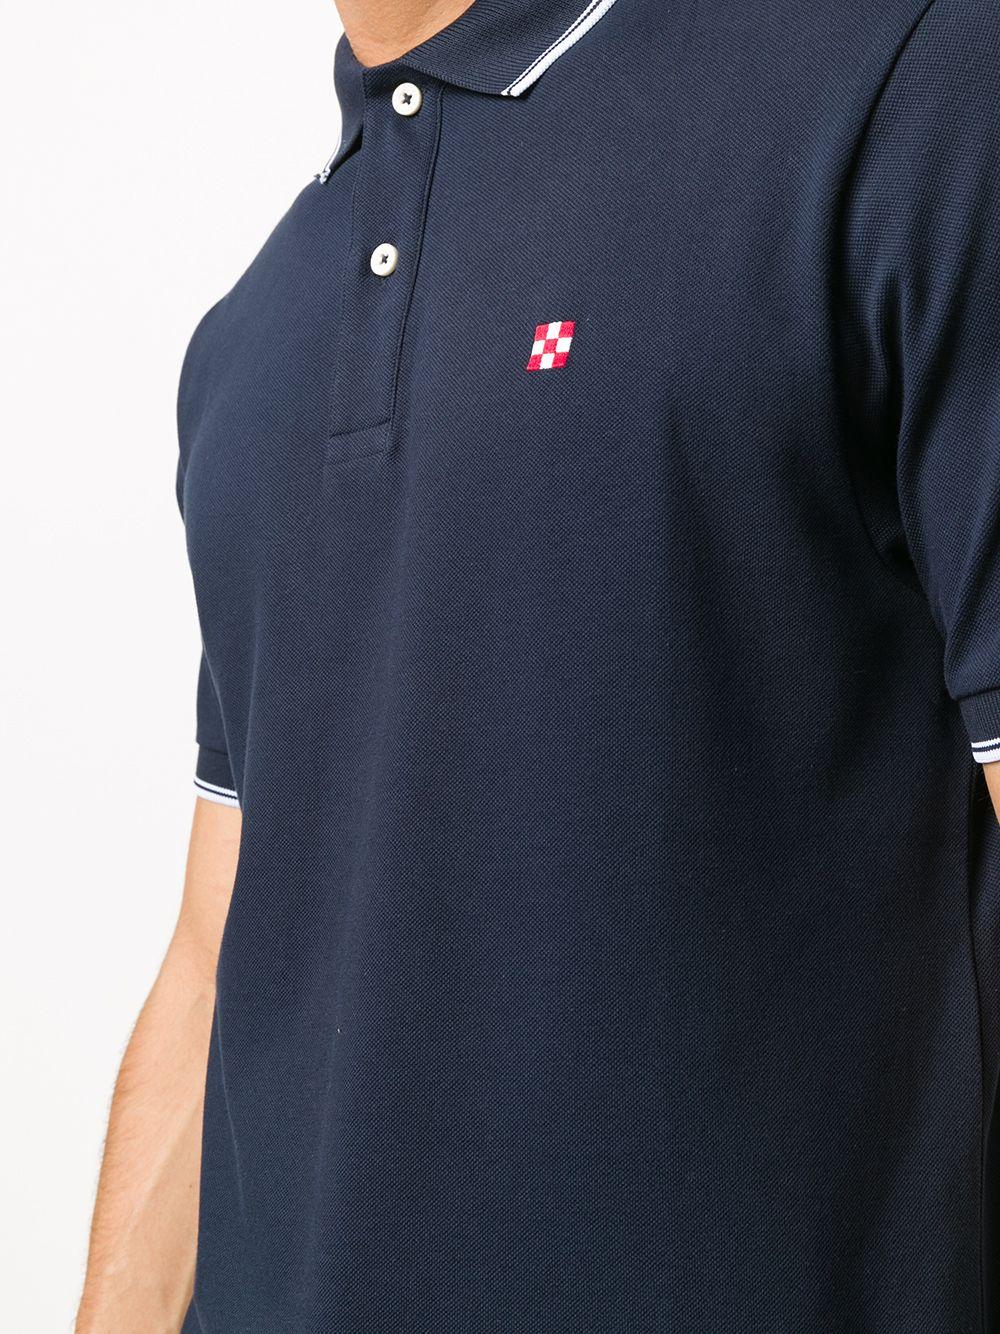 blue cotton Beverly Hills polo shirt  MC2 |  | BEVERLY HILLS6161